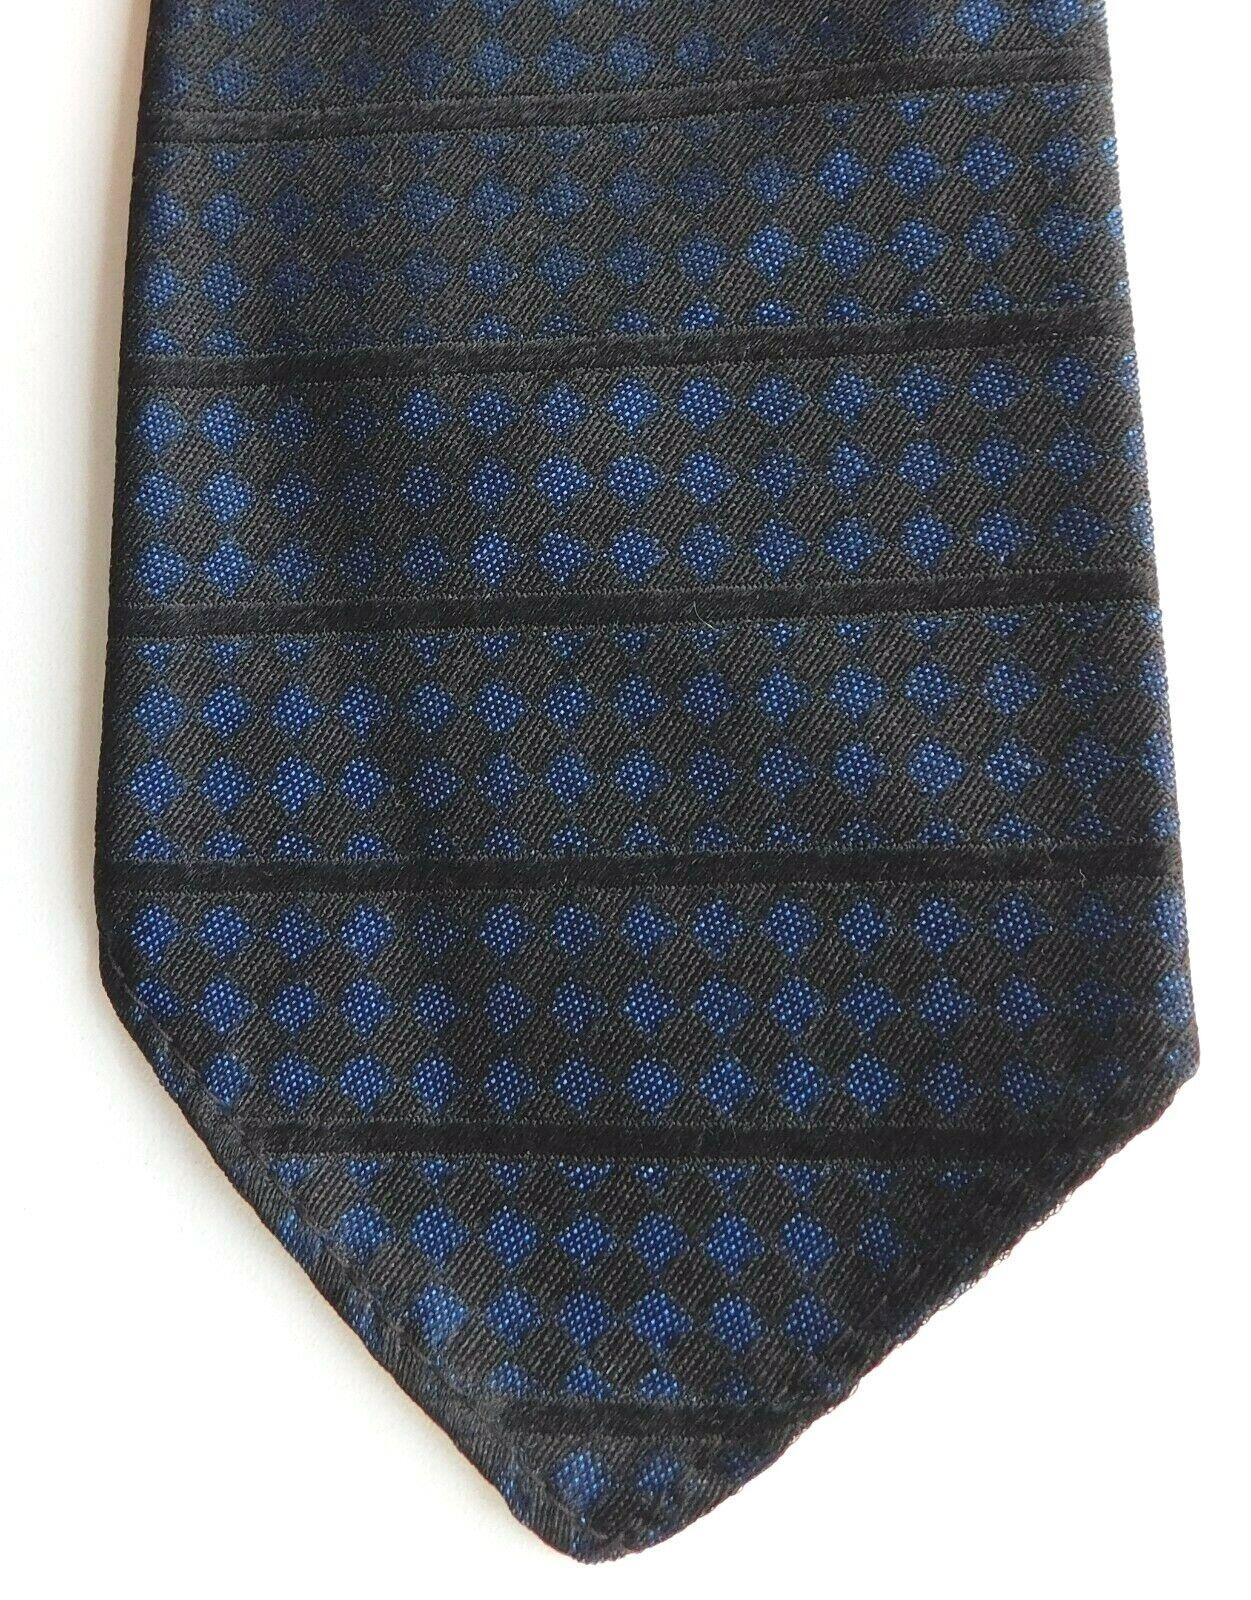 Fortnum & Mason silk tie blue black check vintage good quality English mens wear